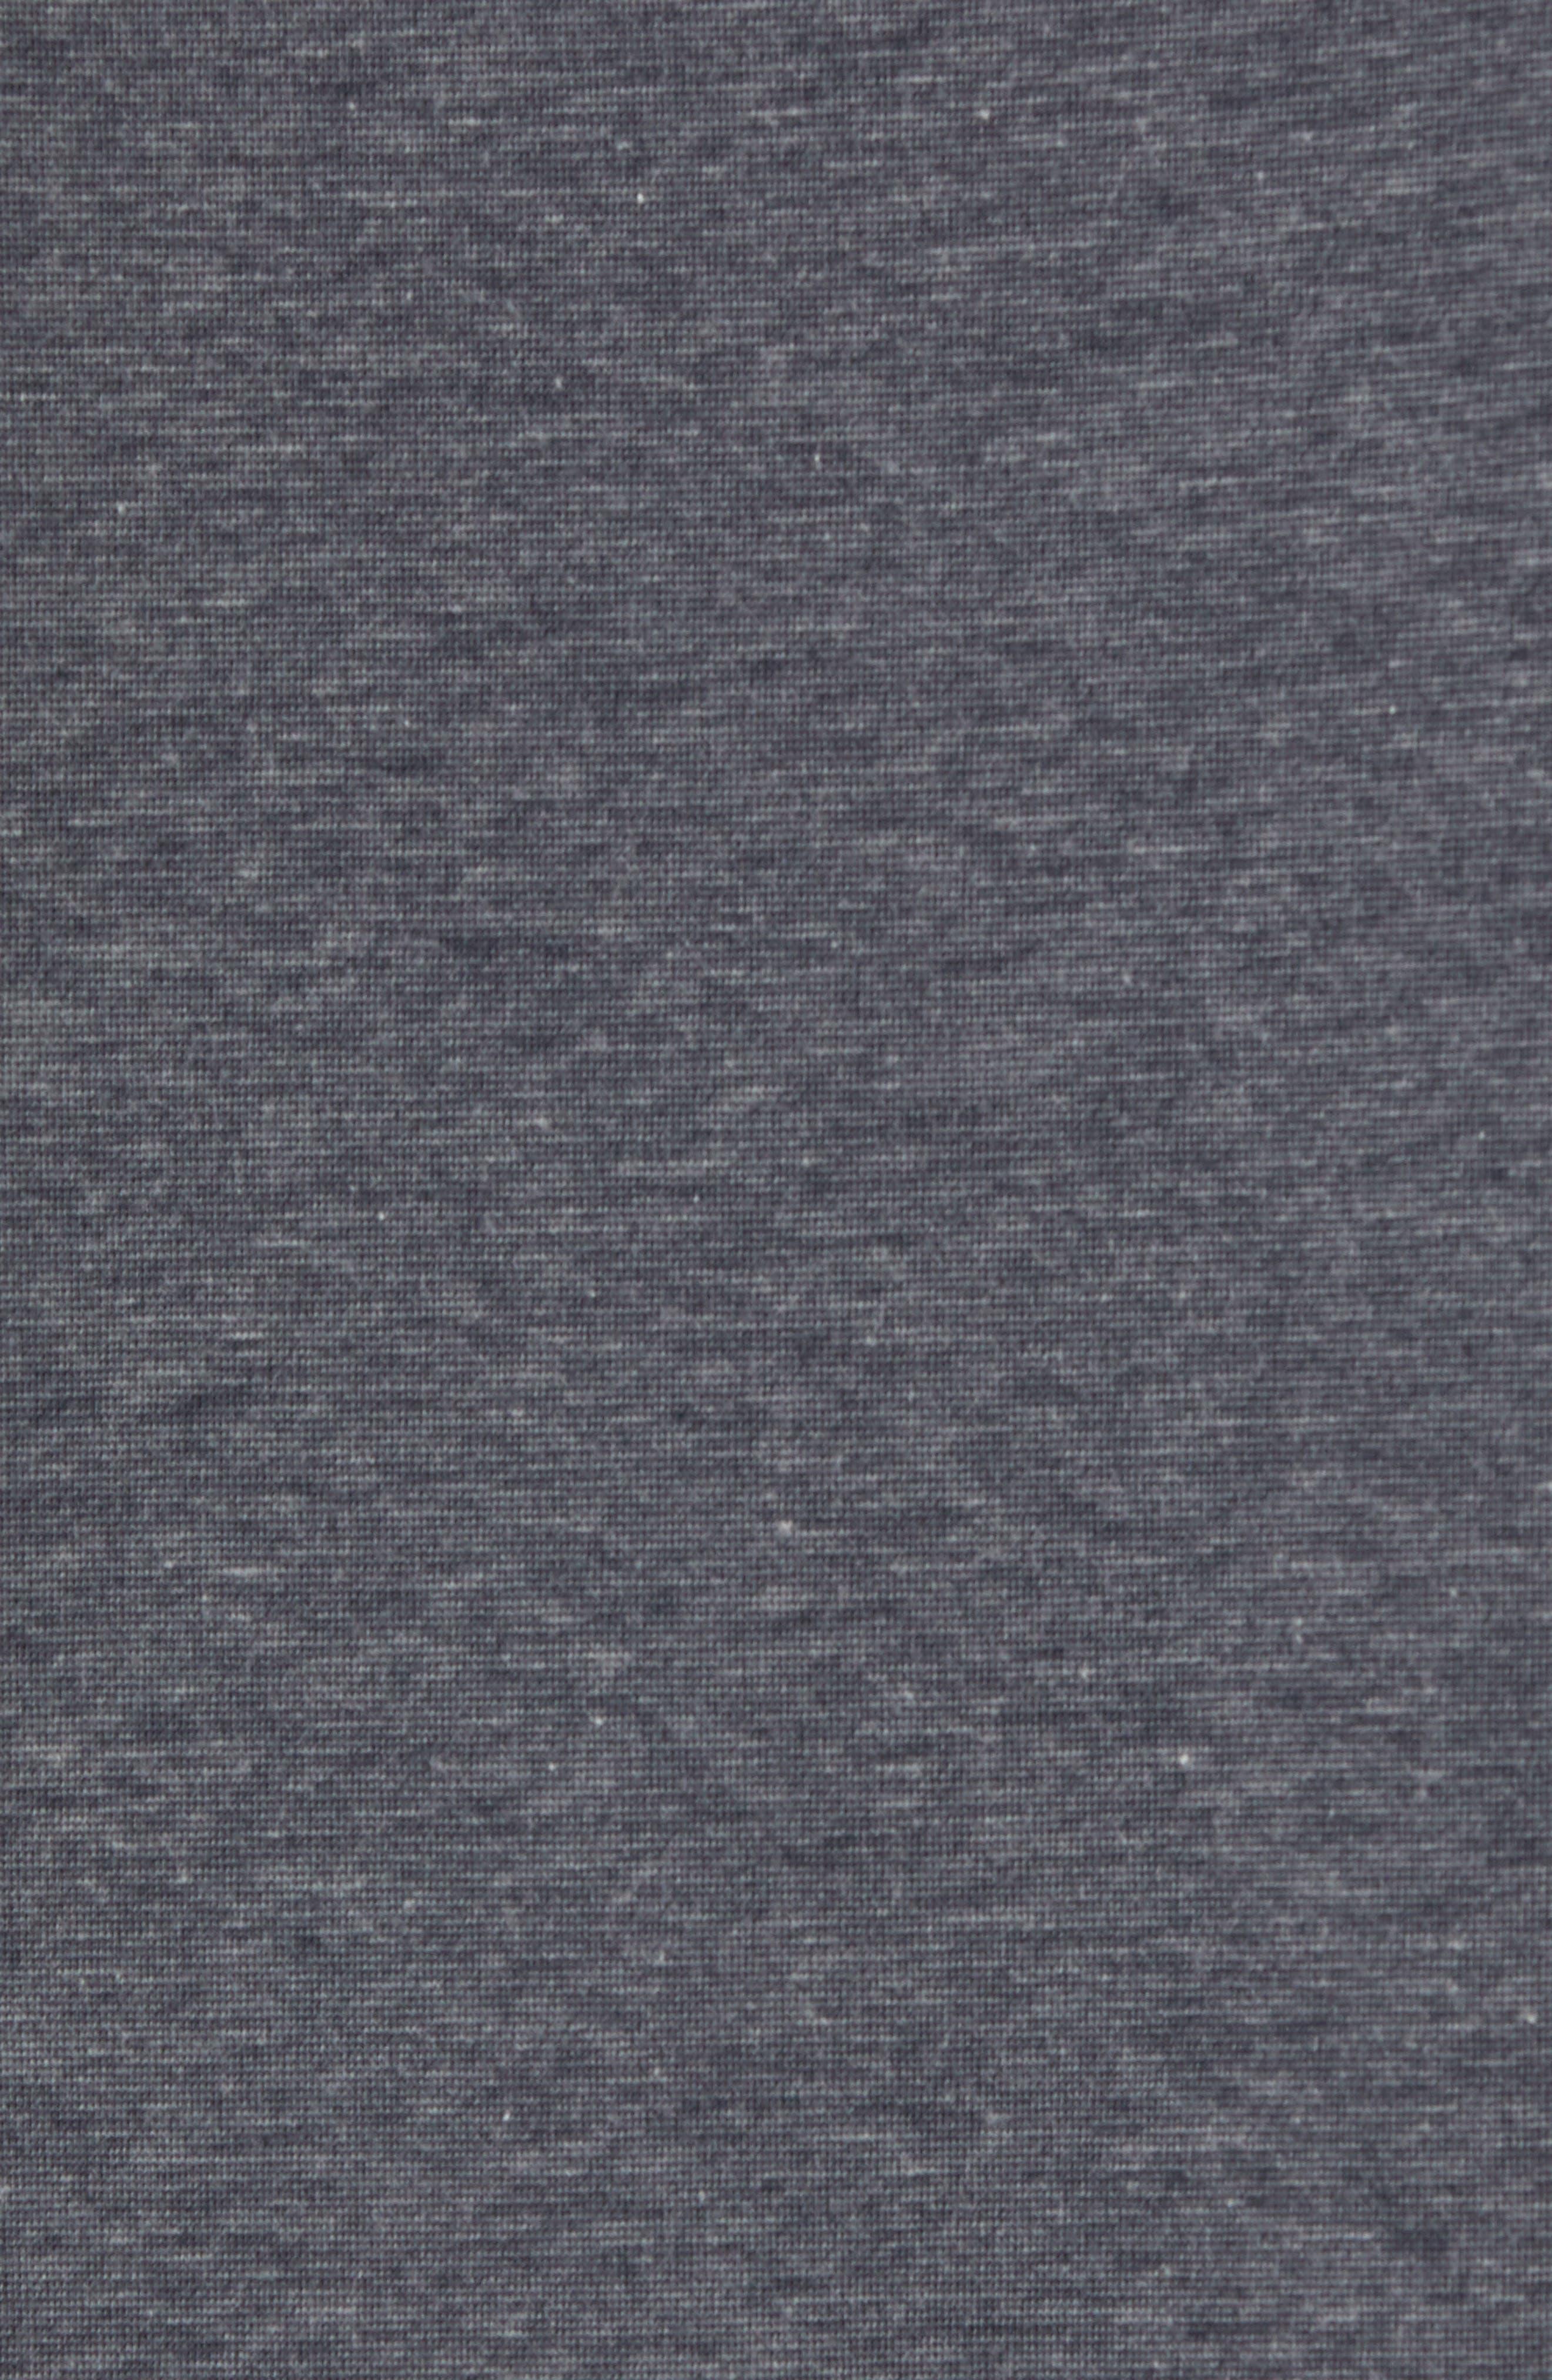 Recline Performance T-Shirt,                             Alternate thumbnail 5, color,                             HEATHER MAGNET